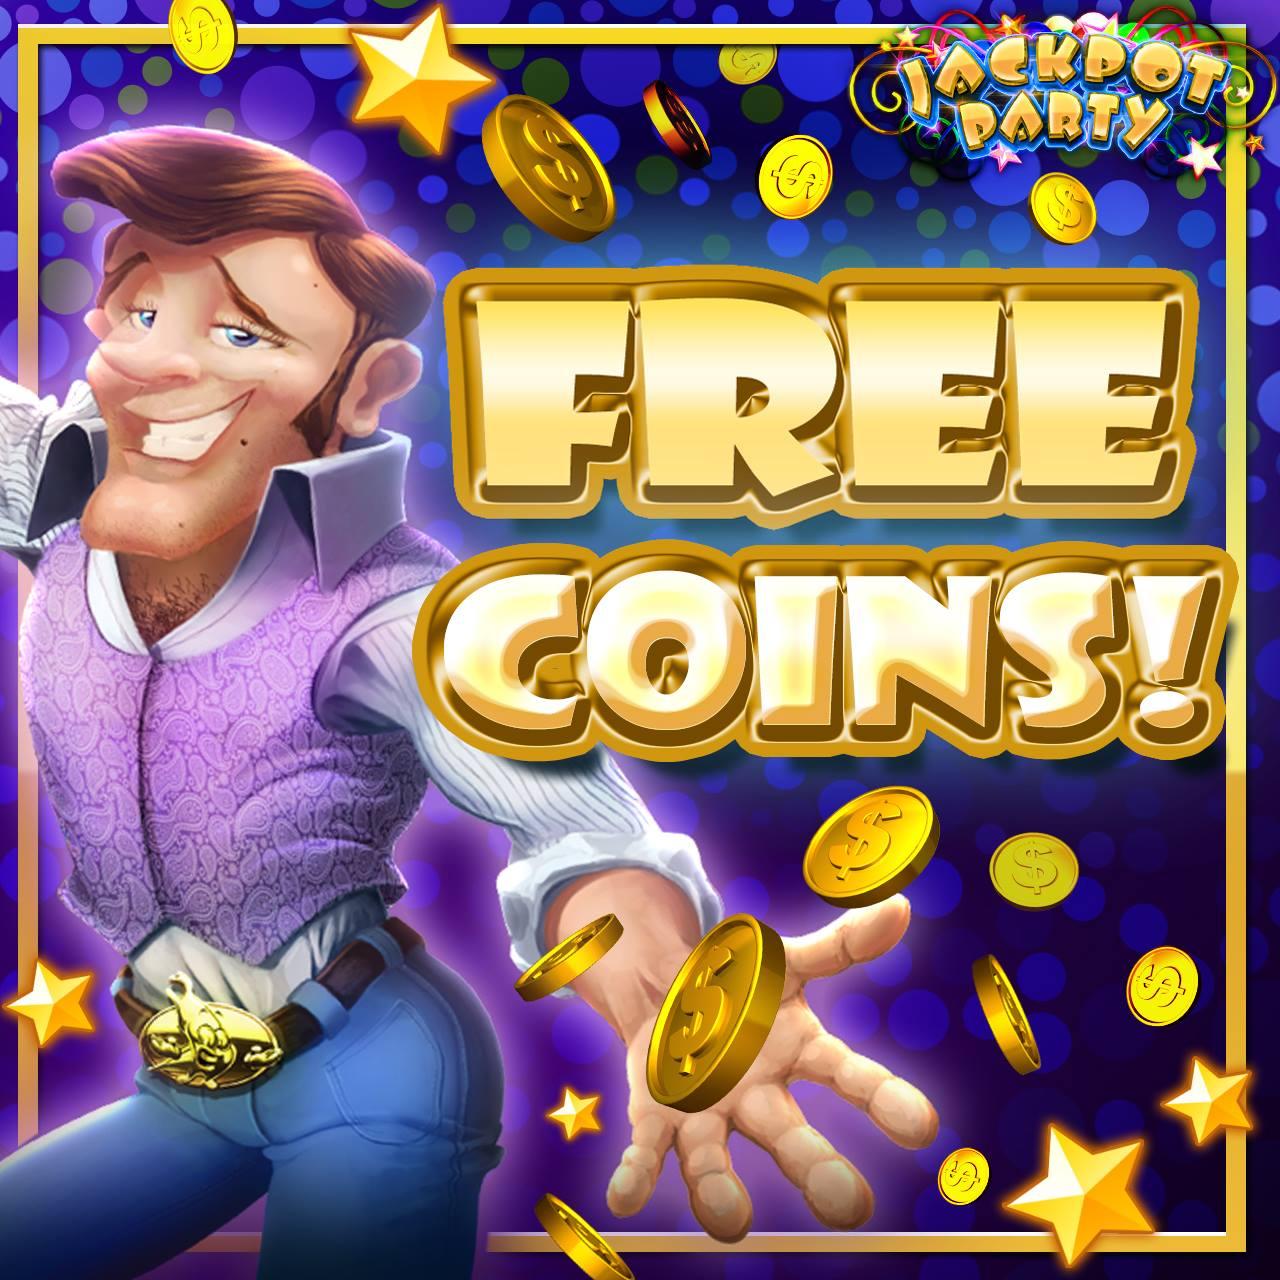 Jackpot Party Free -68931